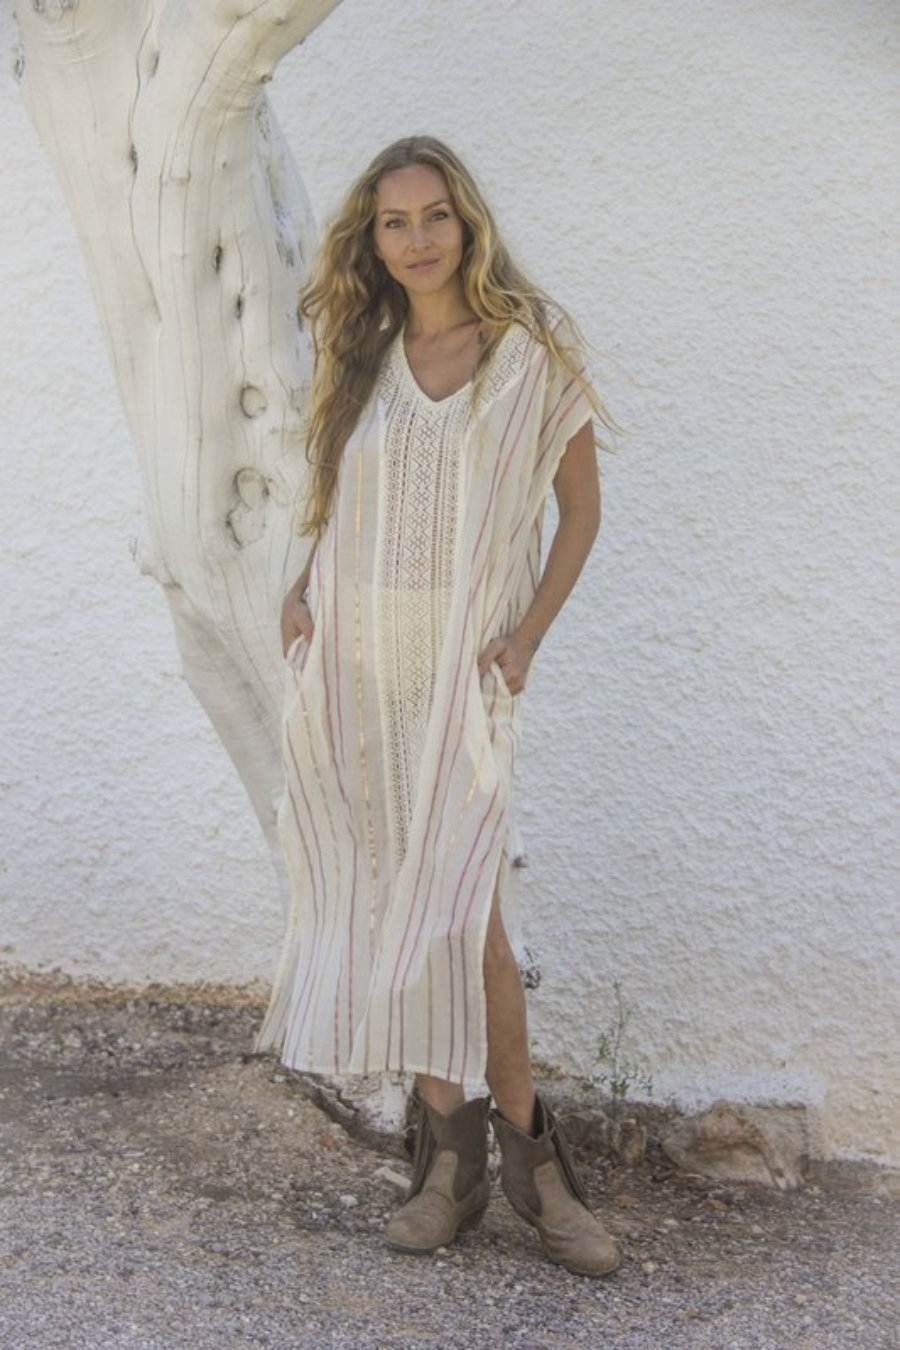 Chilaba túnica larga con bolsillos.  Vestido playa